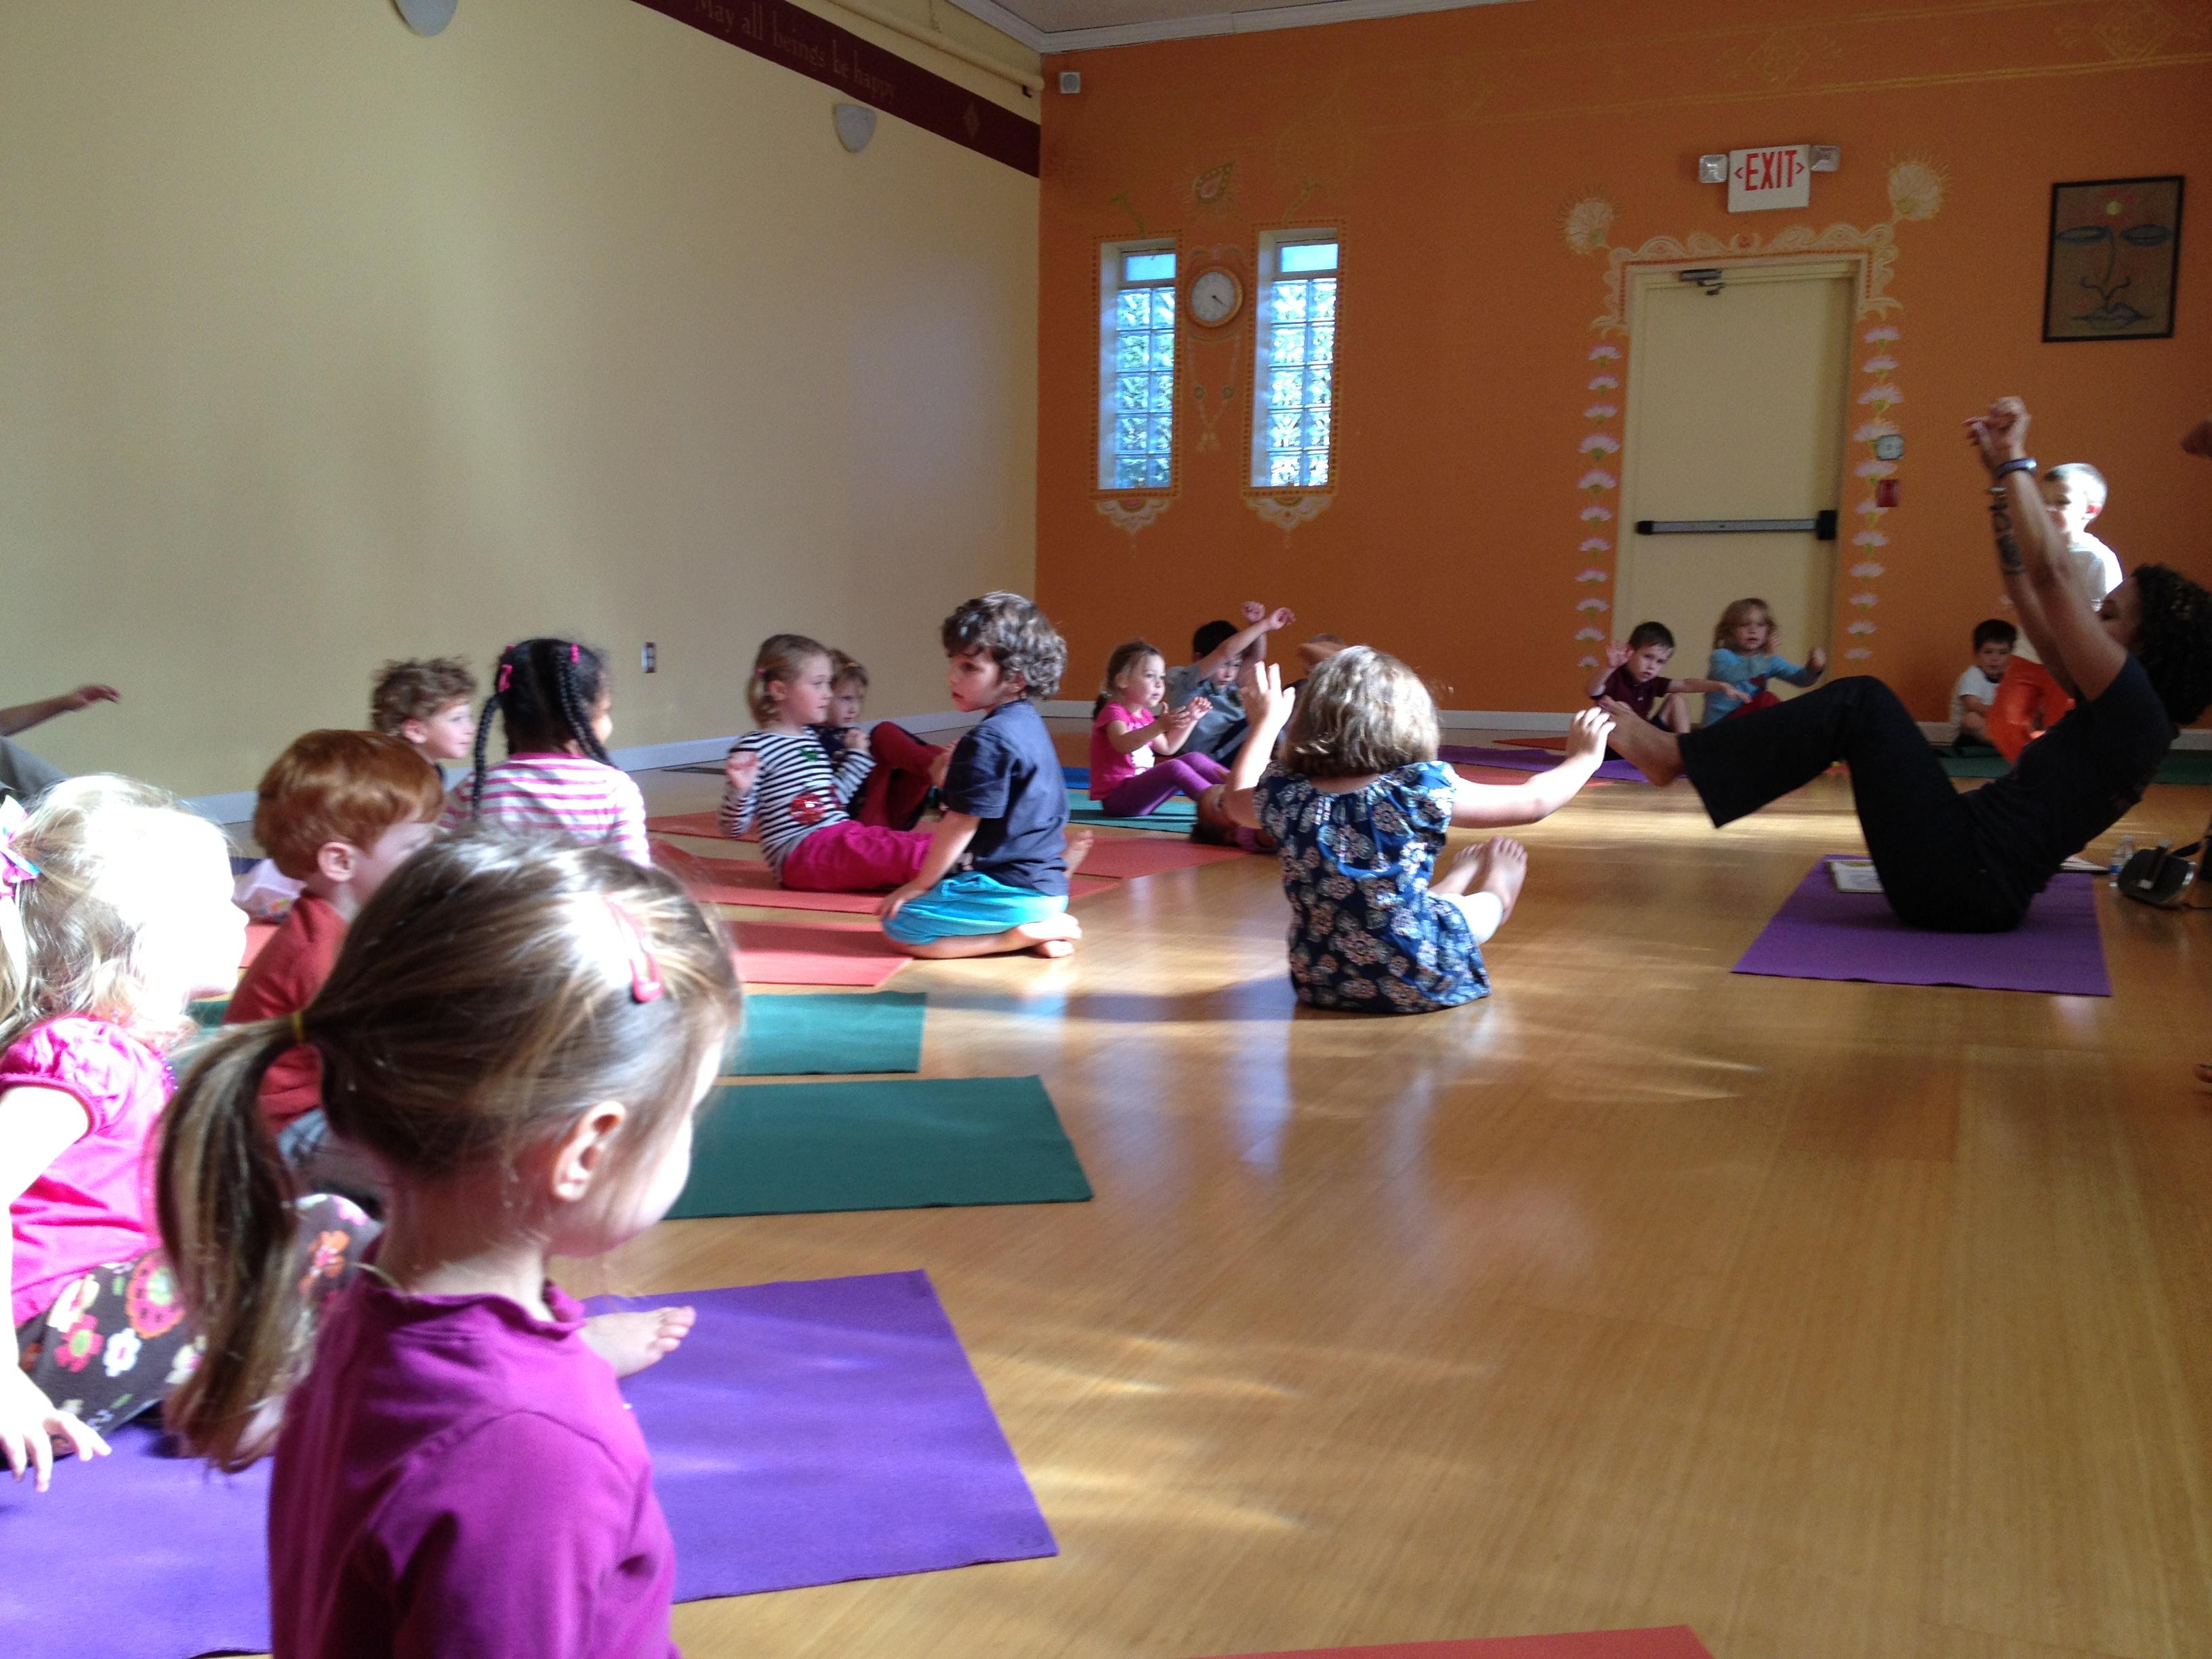 JudiesJuice – When you squeeze me, you get yoga, Reiki